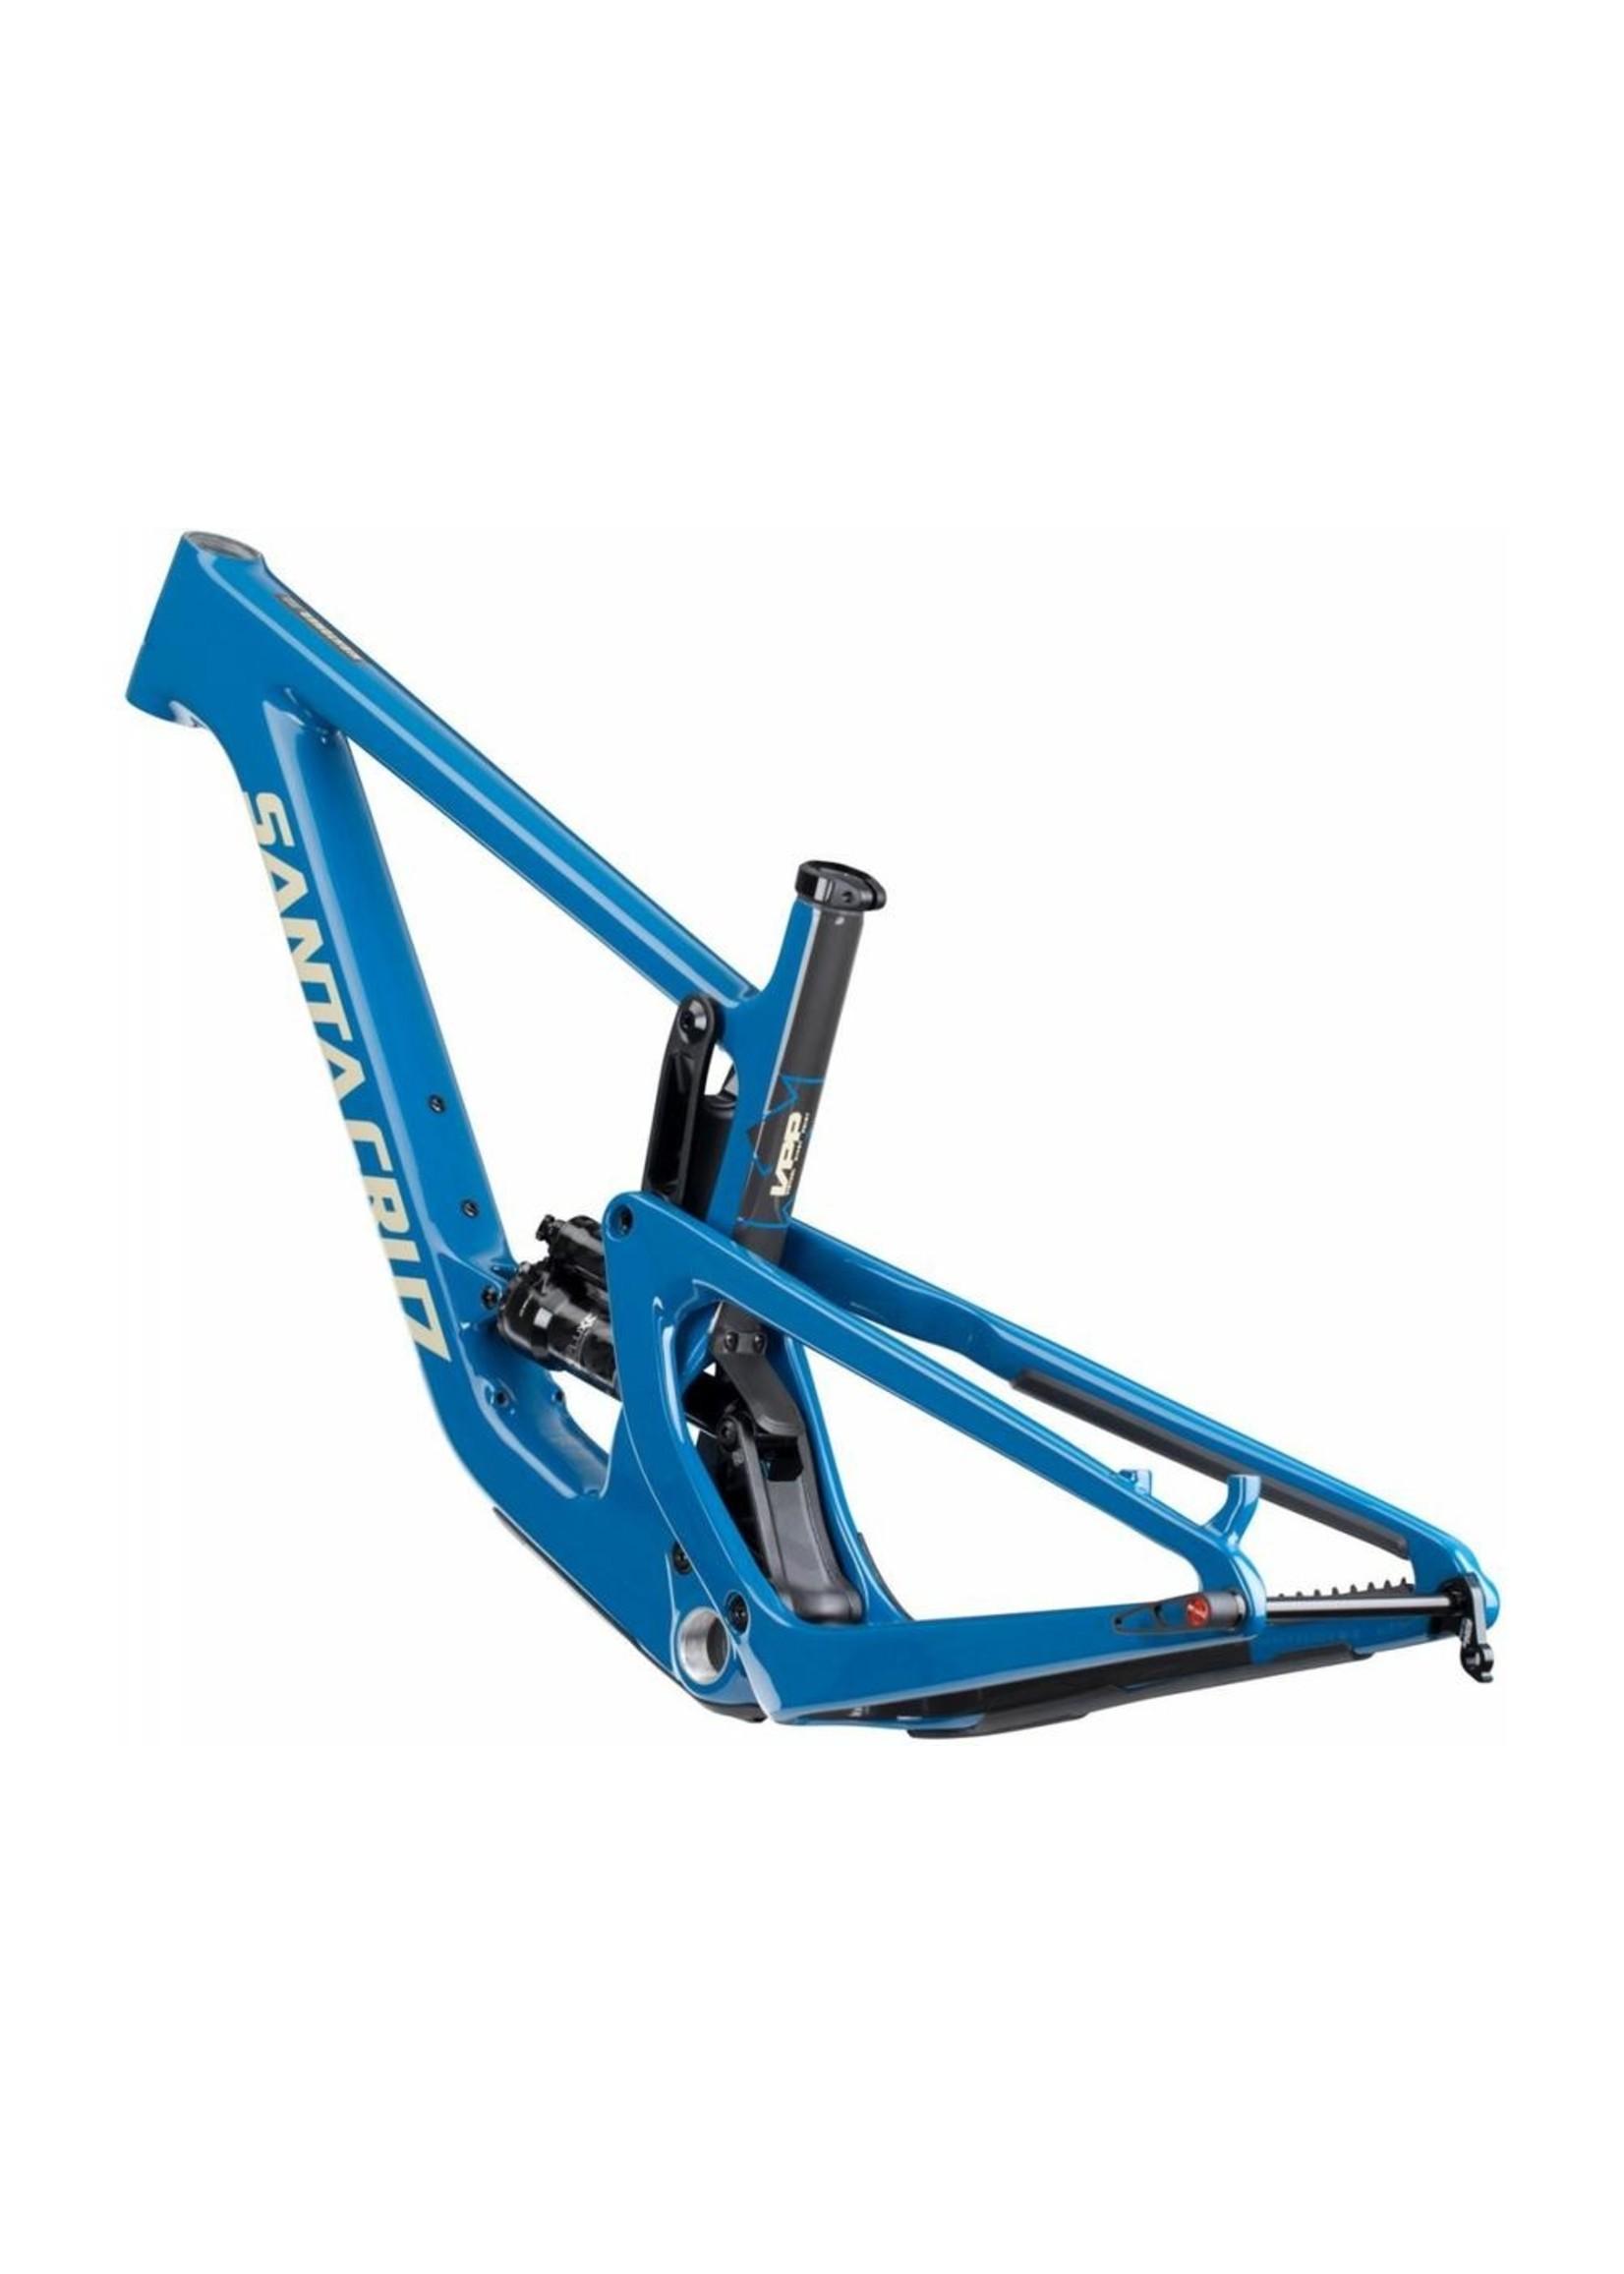 Santa Cruz Bicycles 2020 Santa Cruz Hightower CC, Frameset, Small, Bleu, Rock Shox SuperDeluxe Ultimate